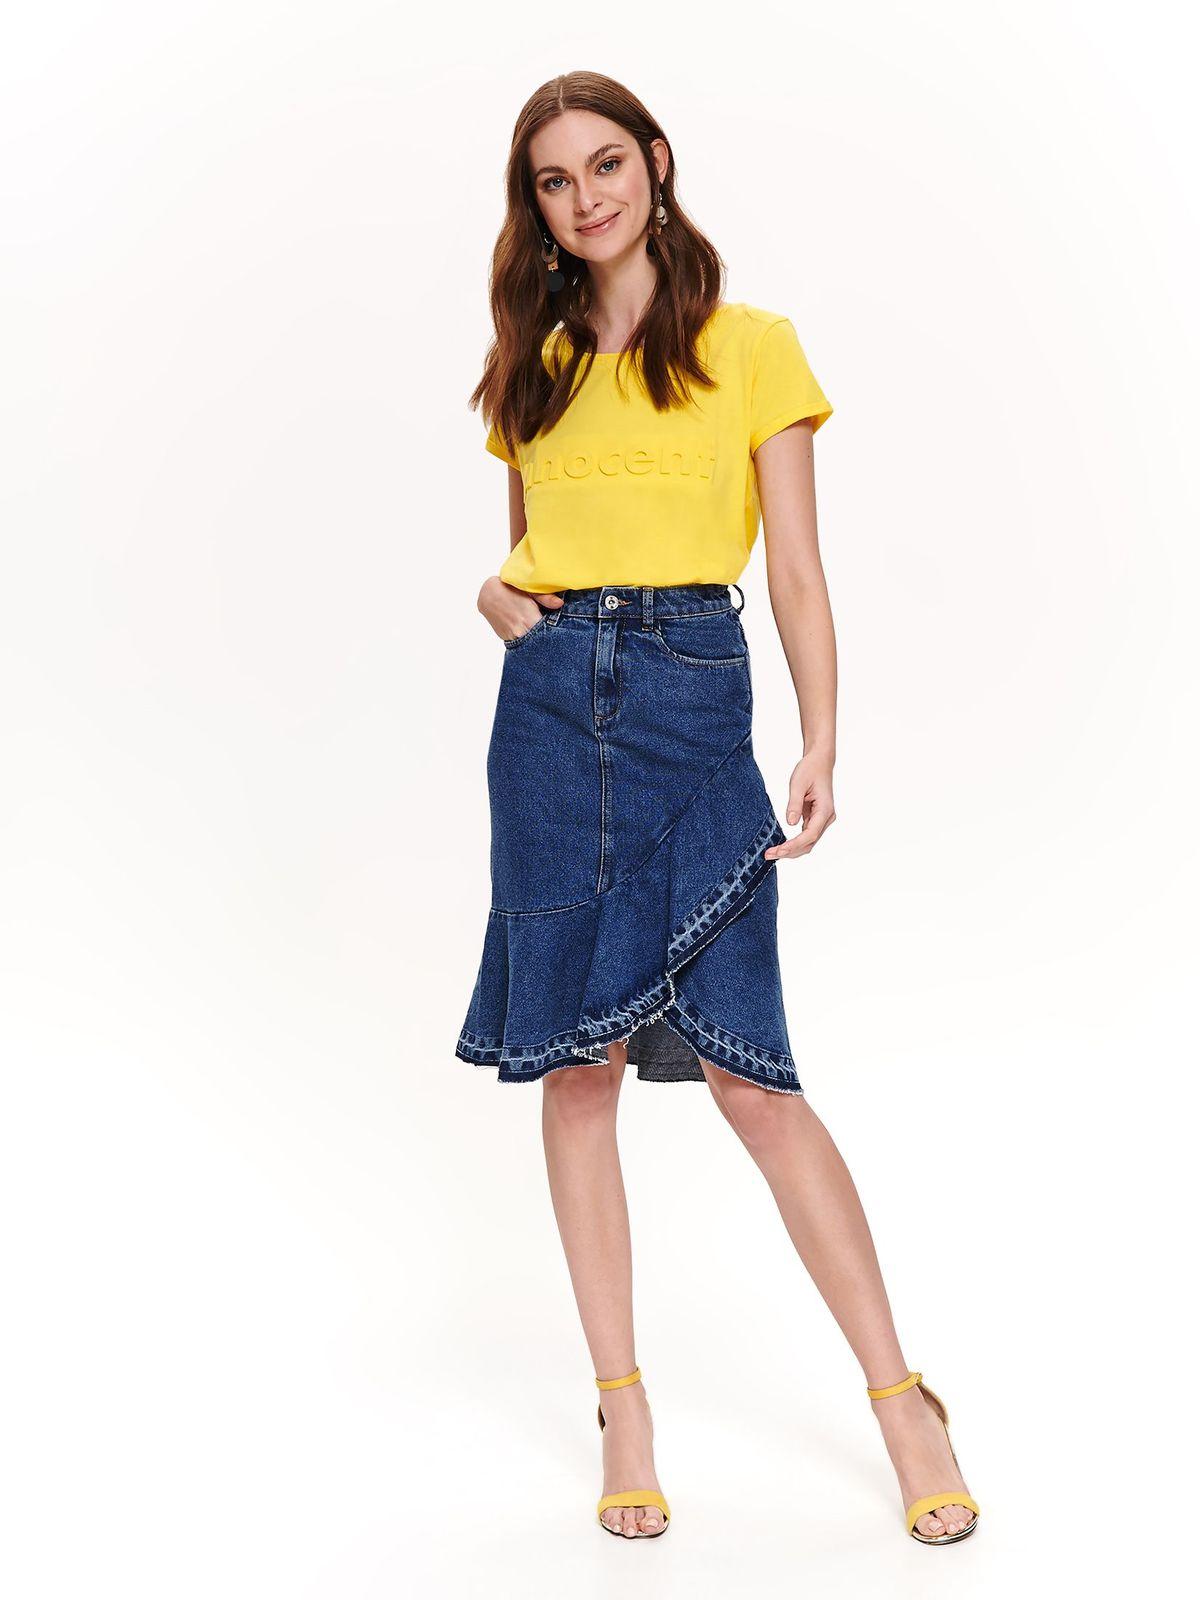 Top Secret yellow casual flared t-shirt cotton short sleeve